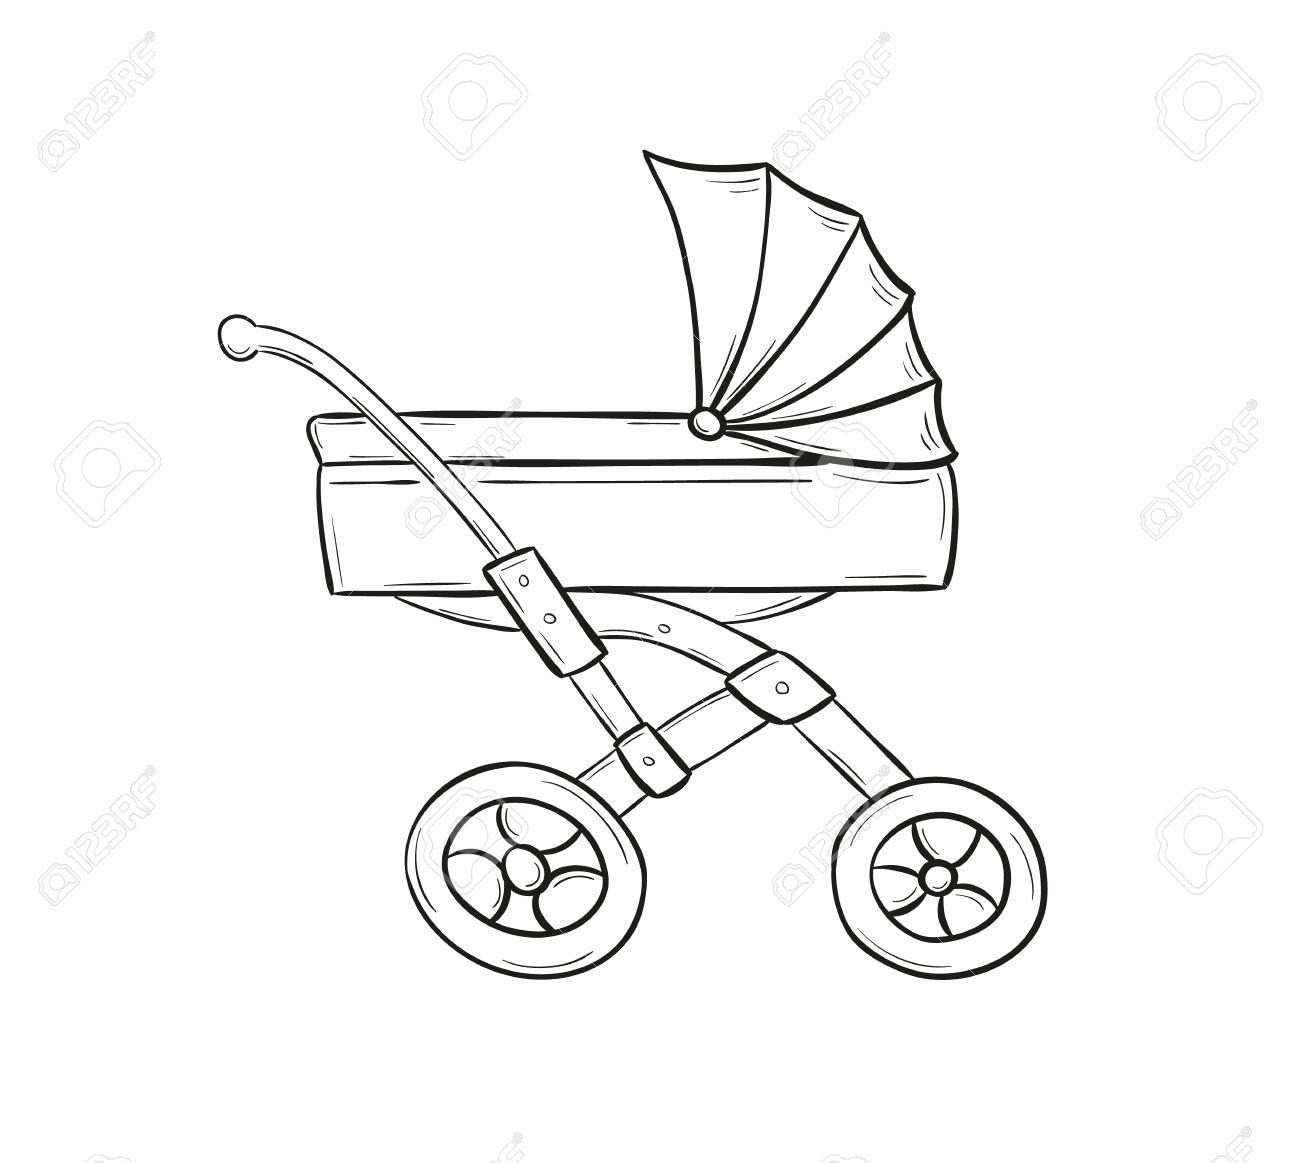 Stroller Drawing At Getdrawings